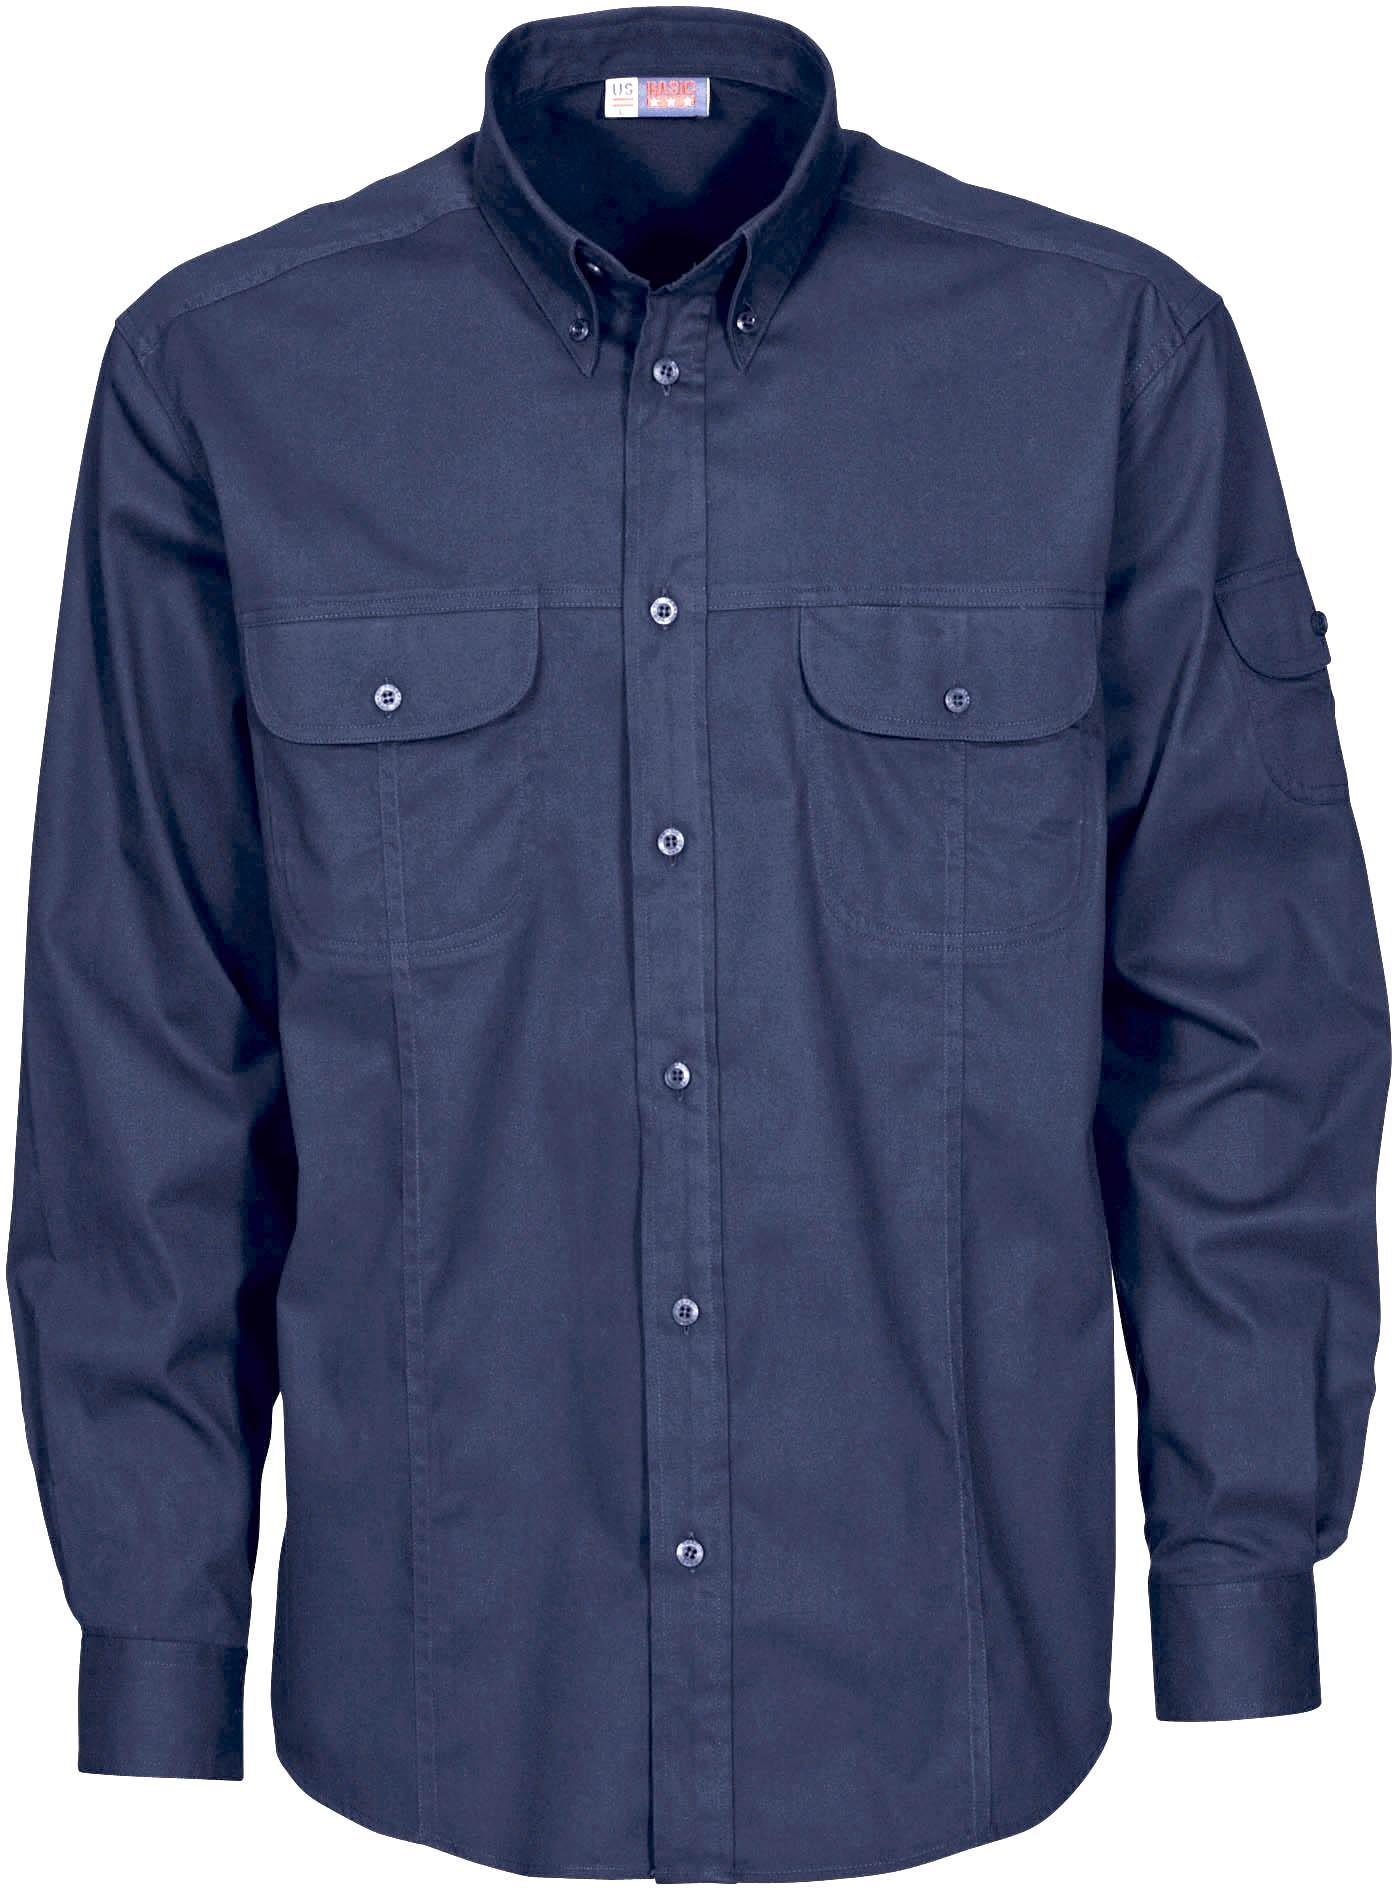 Mens Long Sleeve Phoenix Shirt - Navy Only